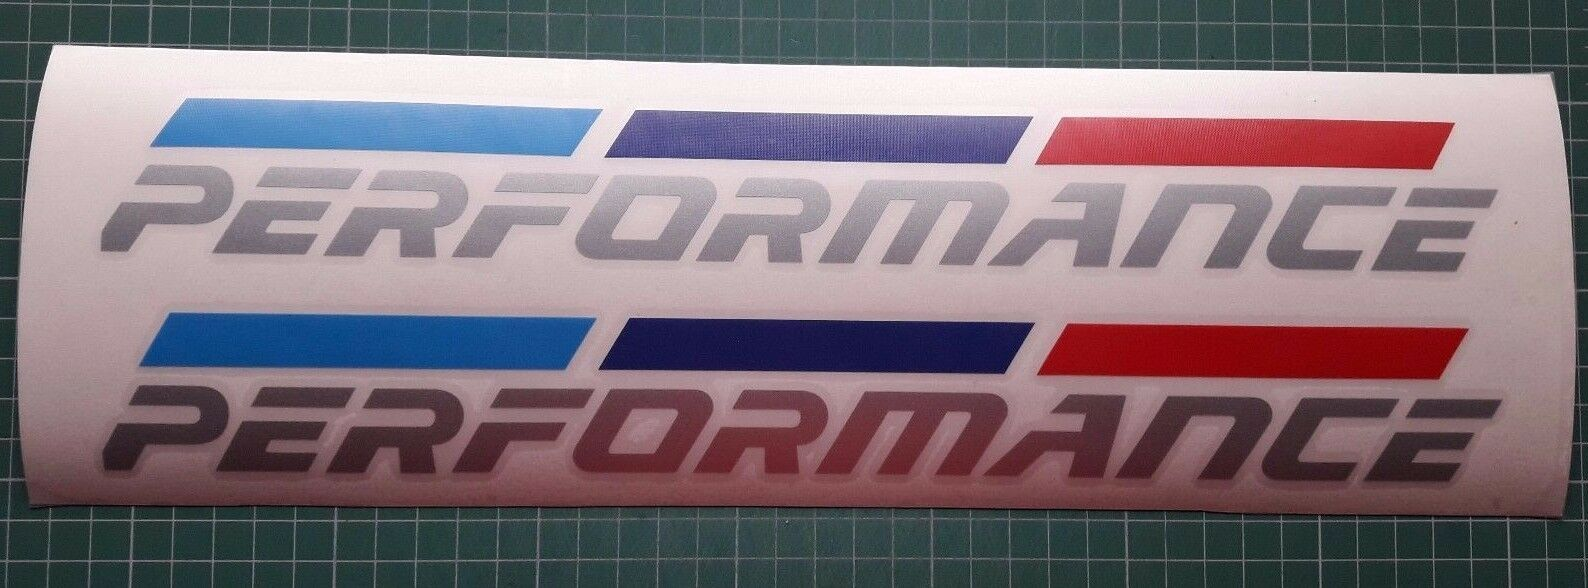 BMW Performance sticker decal